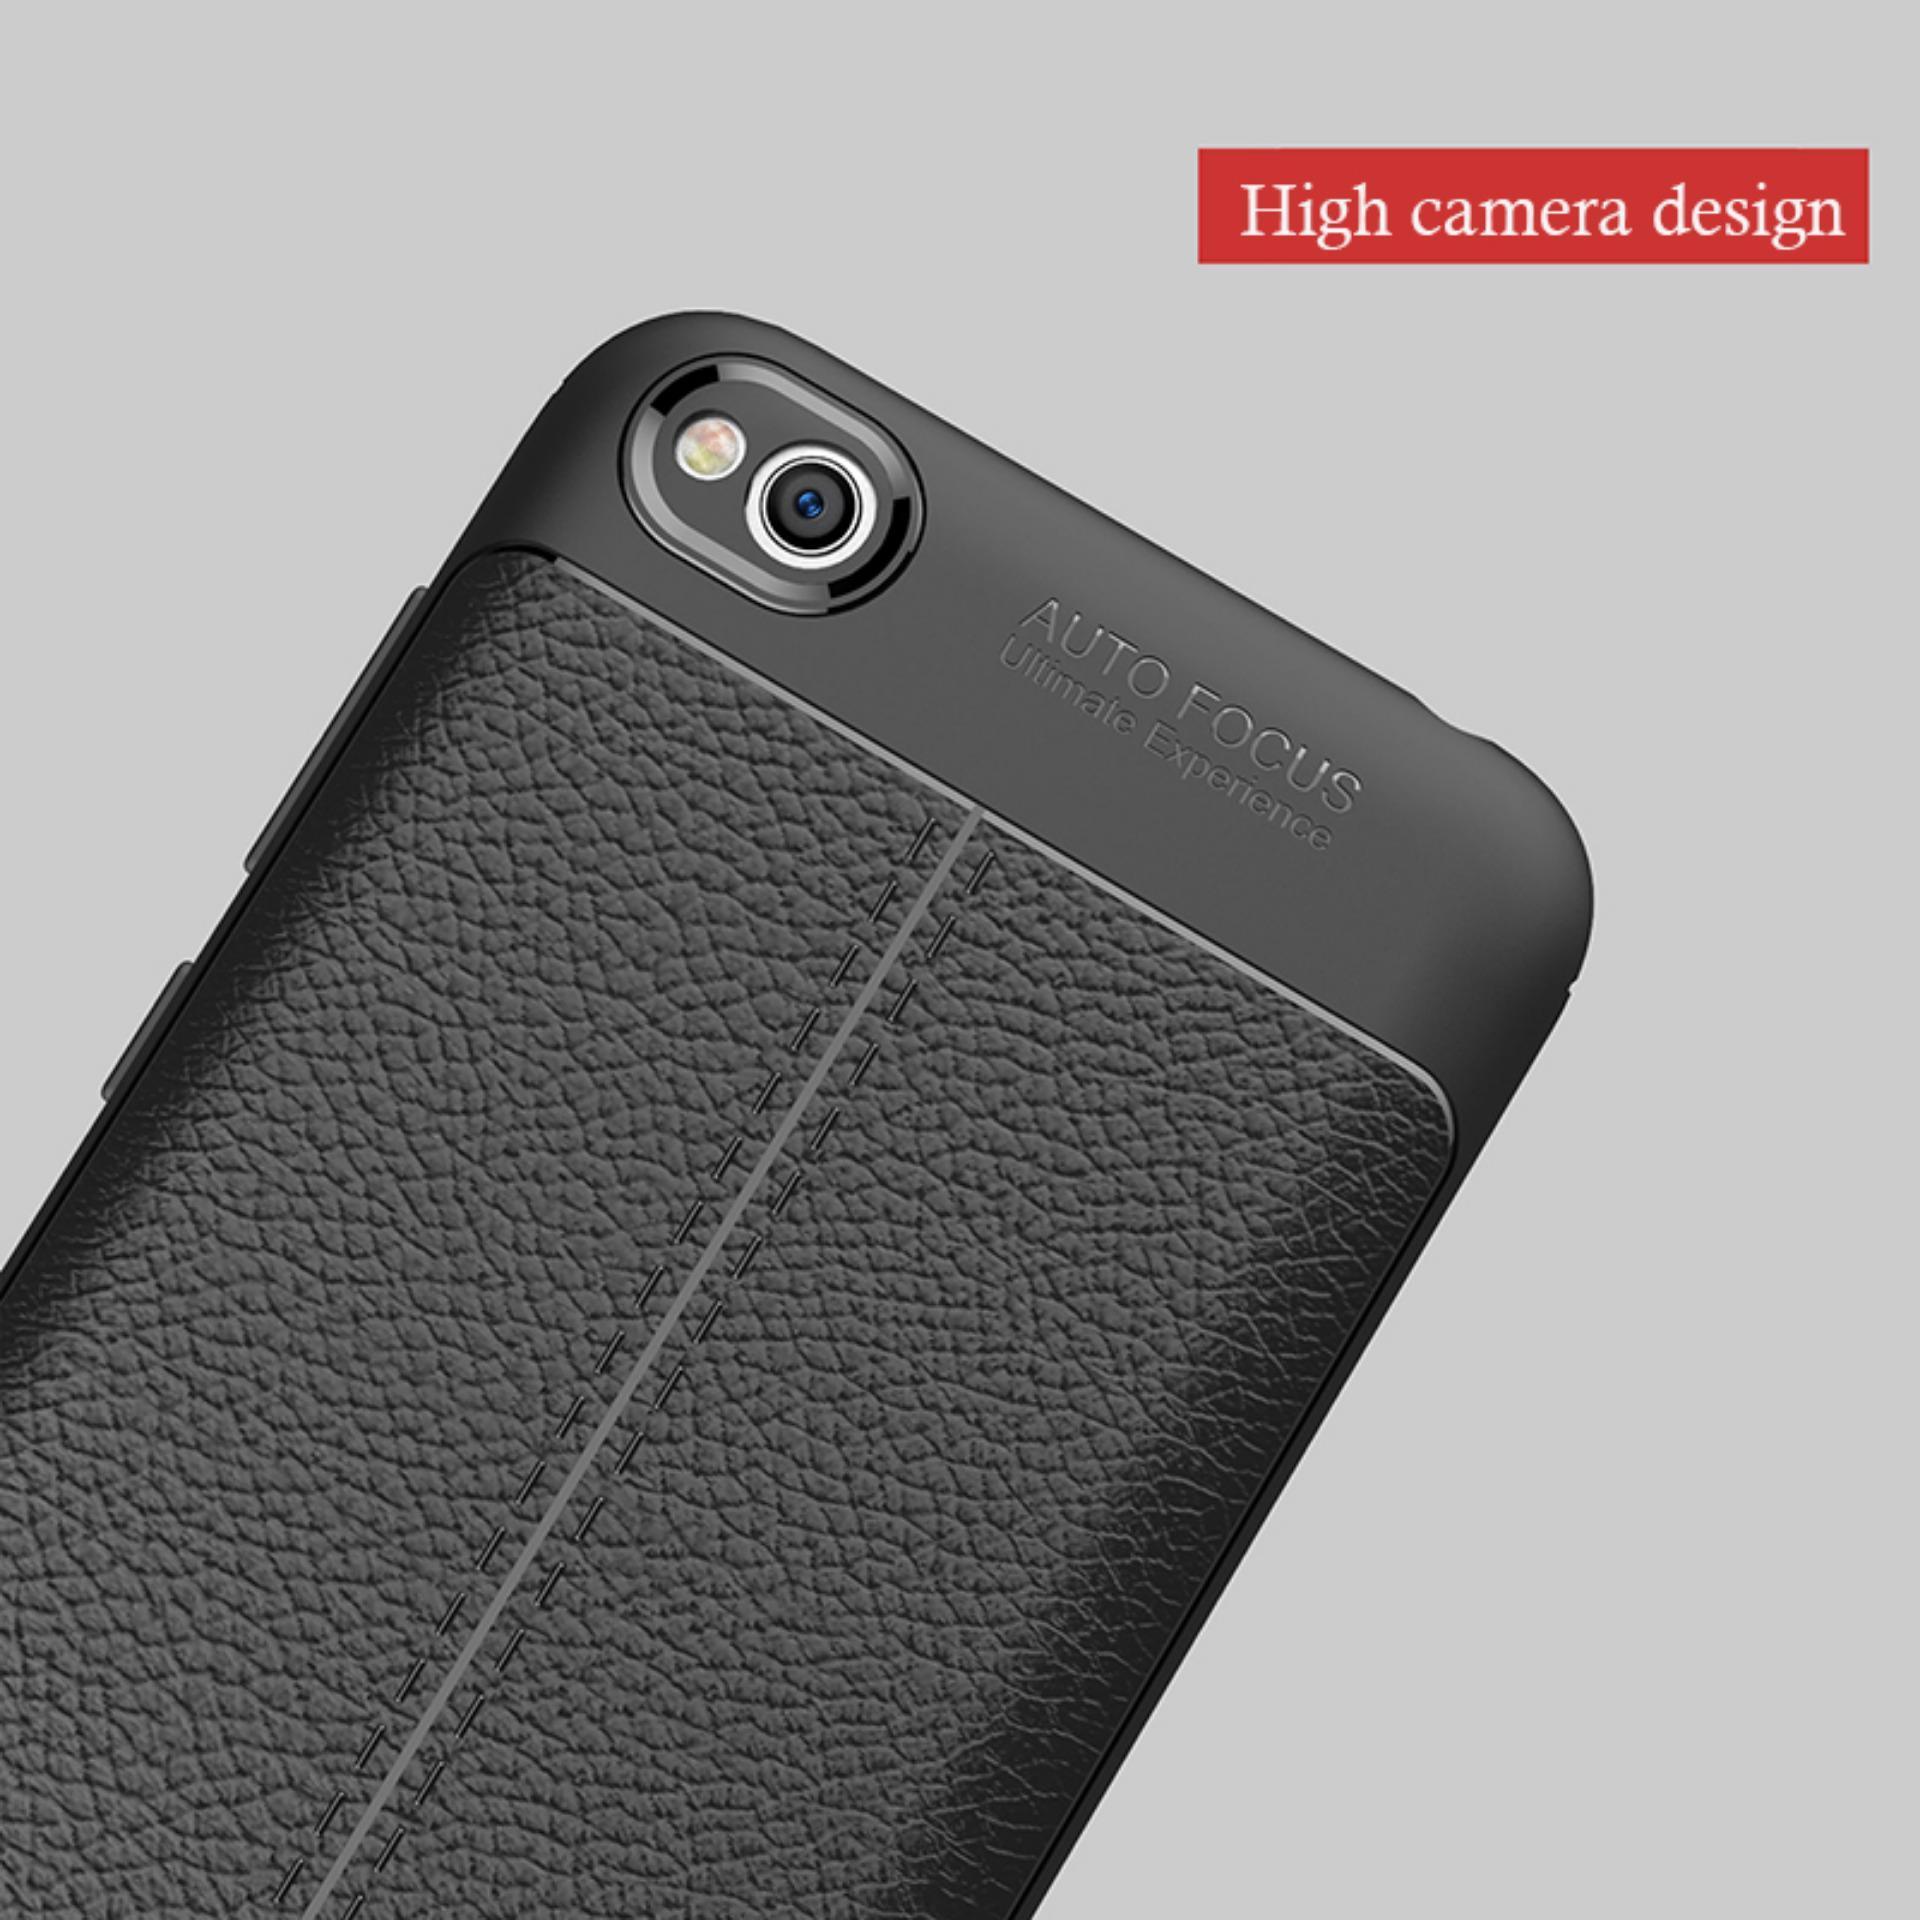 ... Kenzoe Accessories Hp Premium Ultimate Shockproof Leather Case For Xiaomi Redmi 5A - Black - 4 ...